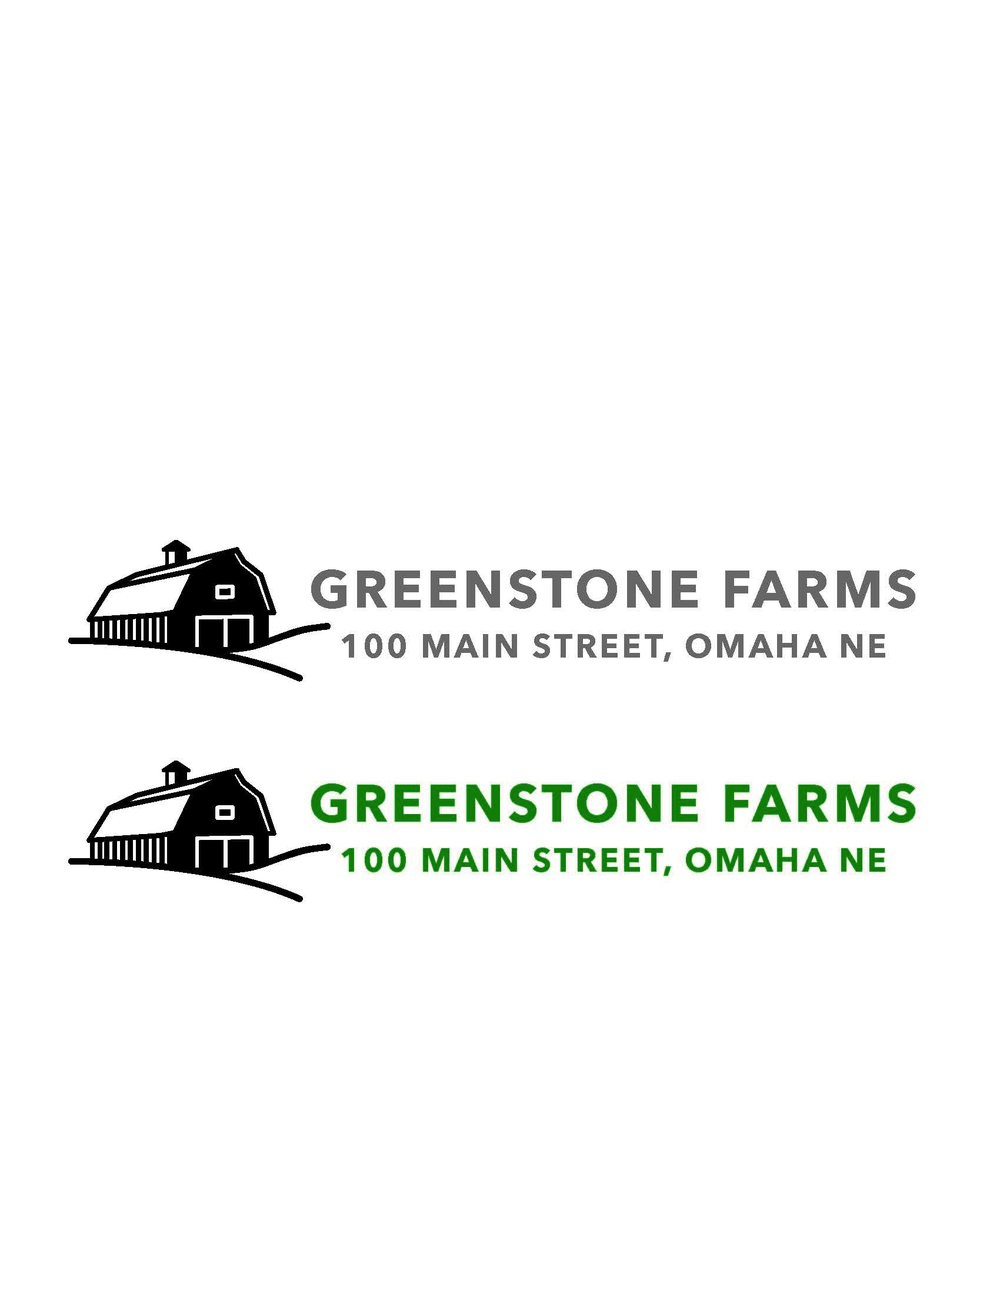 greenstone_logo.10.21.16_Page_3.jpg